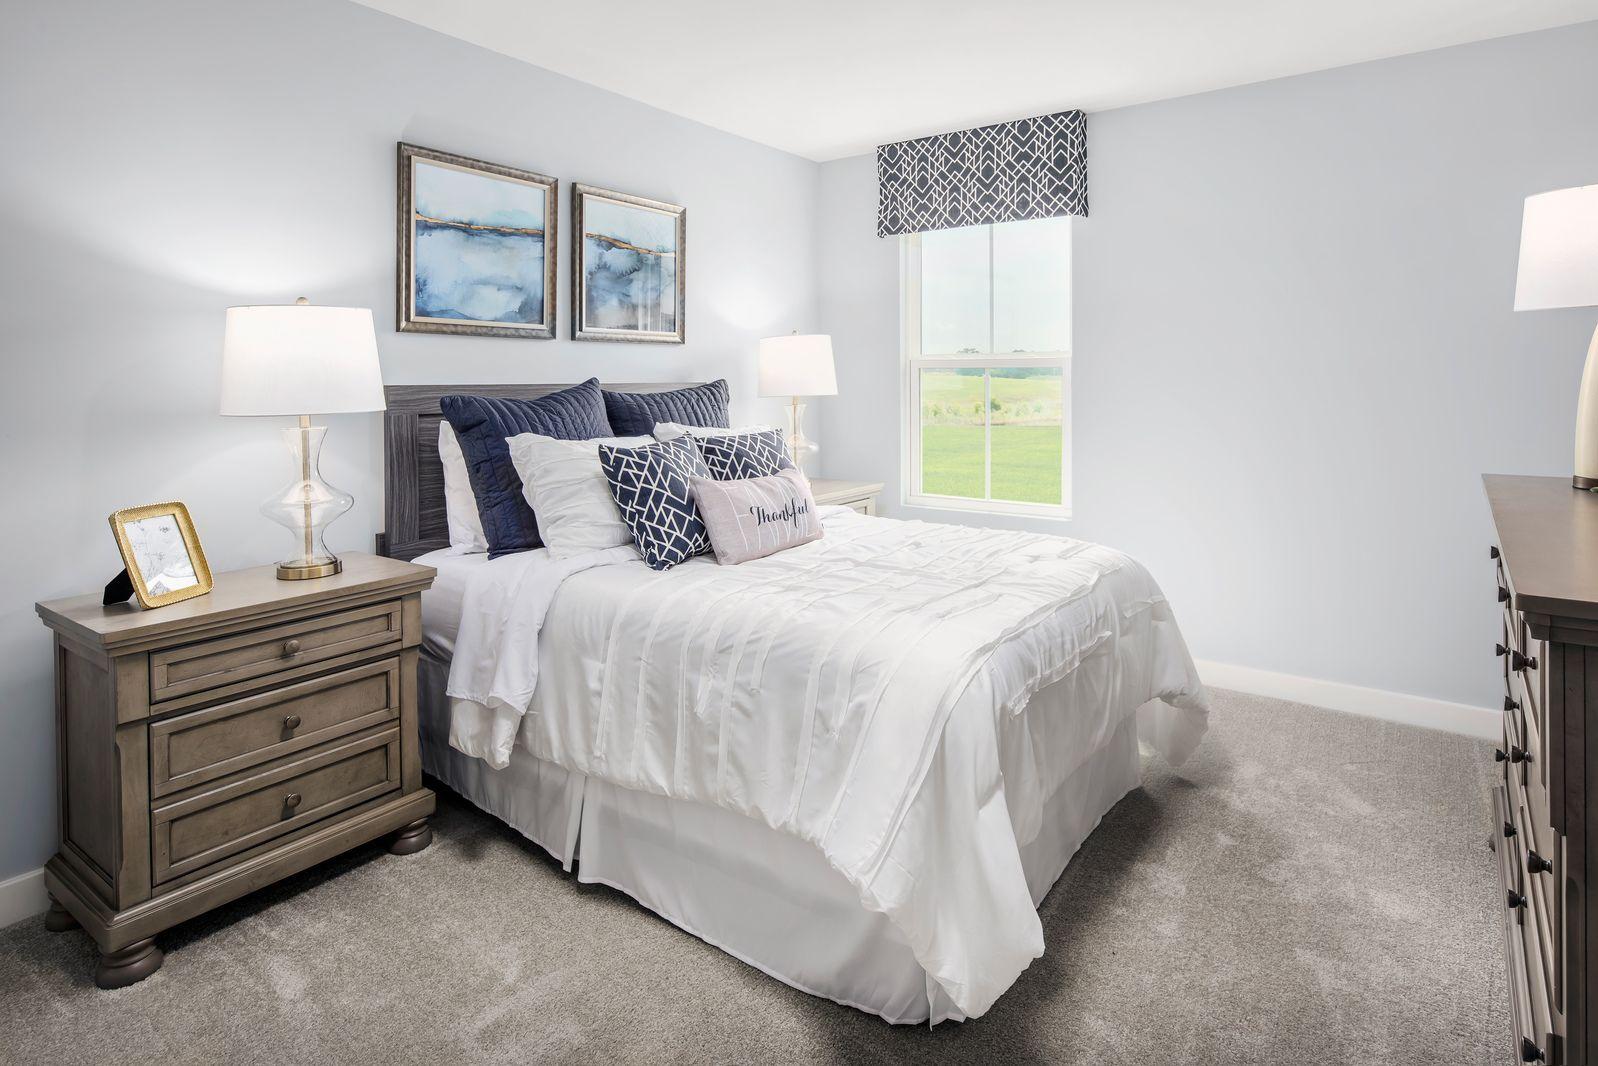 Bedroom featured in the Eden Cay By Ryan Homes in Norfolk-Newport News, VA